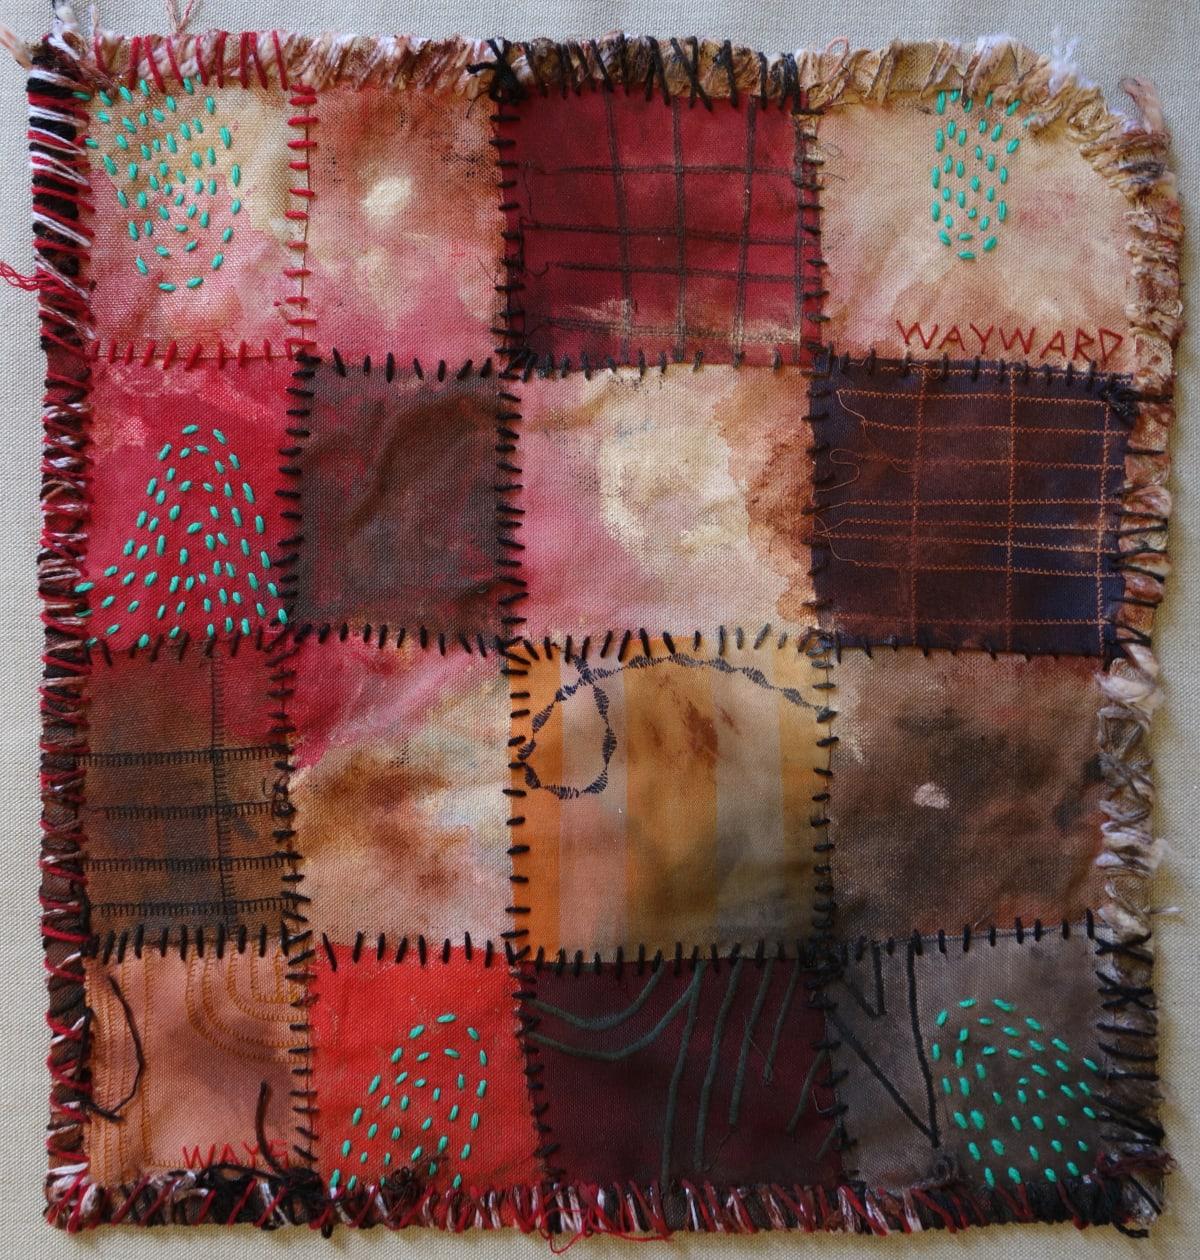 Stephen Eastaugh MUDMAPS 8 (Wayward ways) Broome acrylic, thread, linen 45 x 45 cm